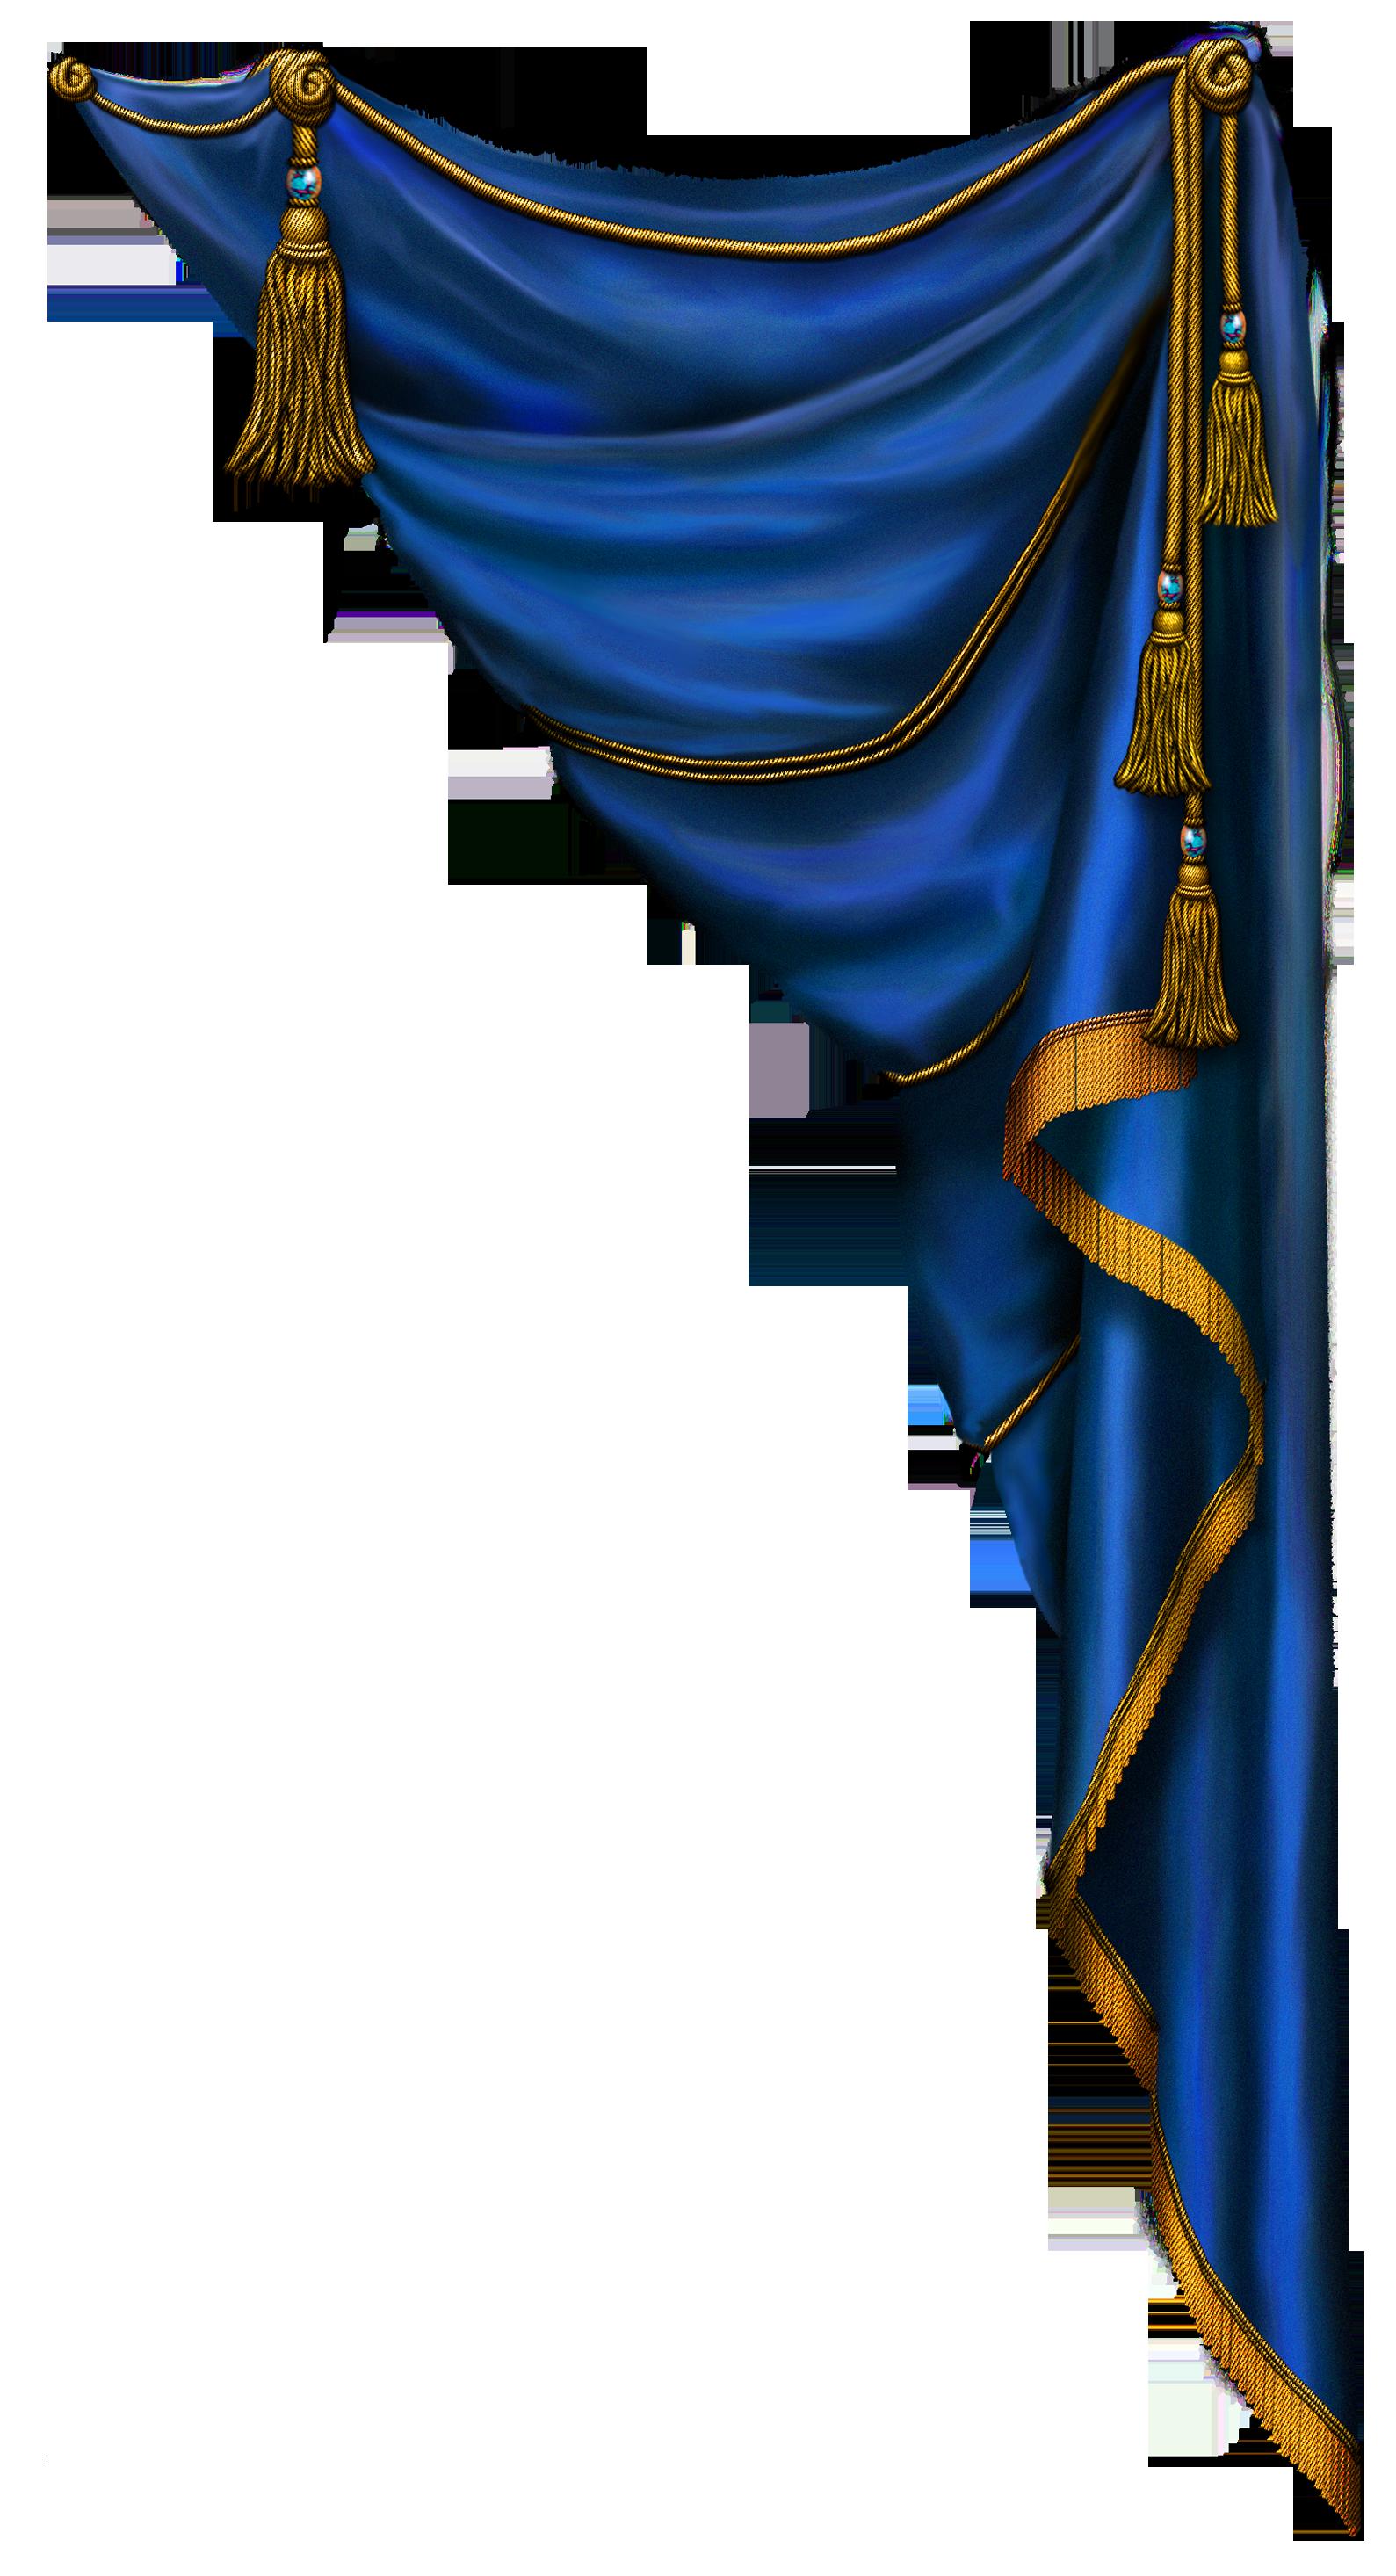 Curtain clipart blue curtain Curtain Blue BORDERS Pinterest PNG